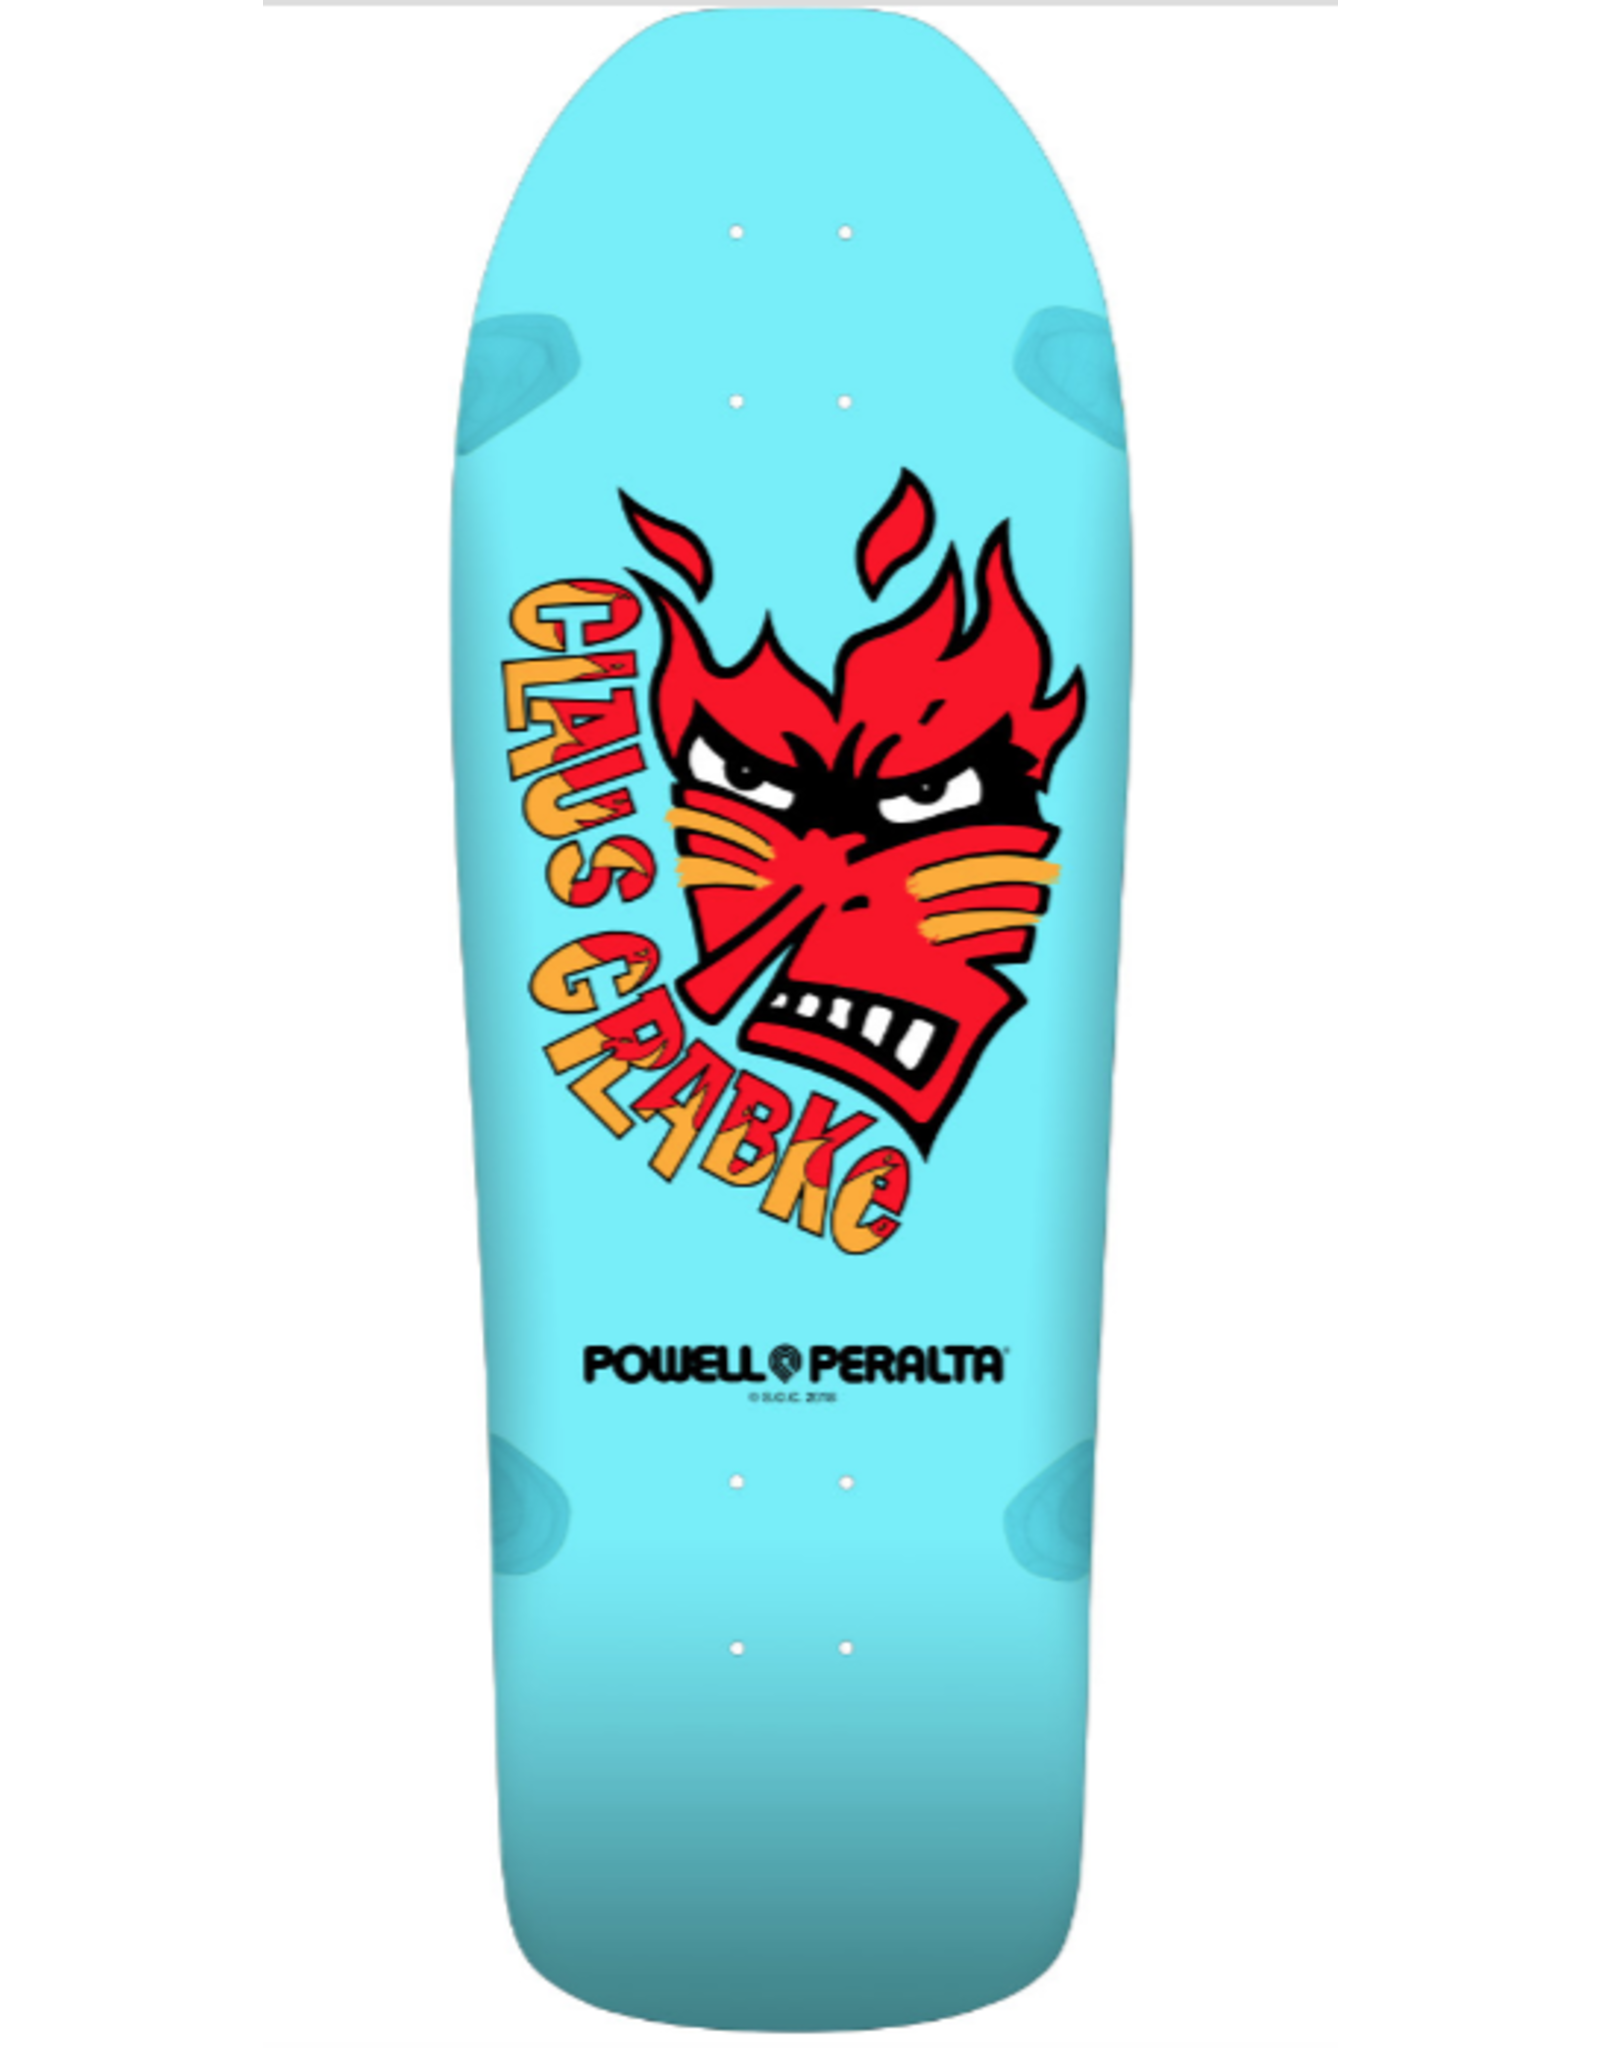 POWELL Powell Peralta Claus Grabke Skateboard Deck Aqua - Shape 287 SP0 - 10.25 x 30.5